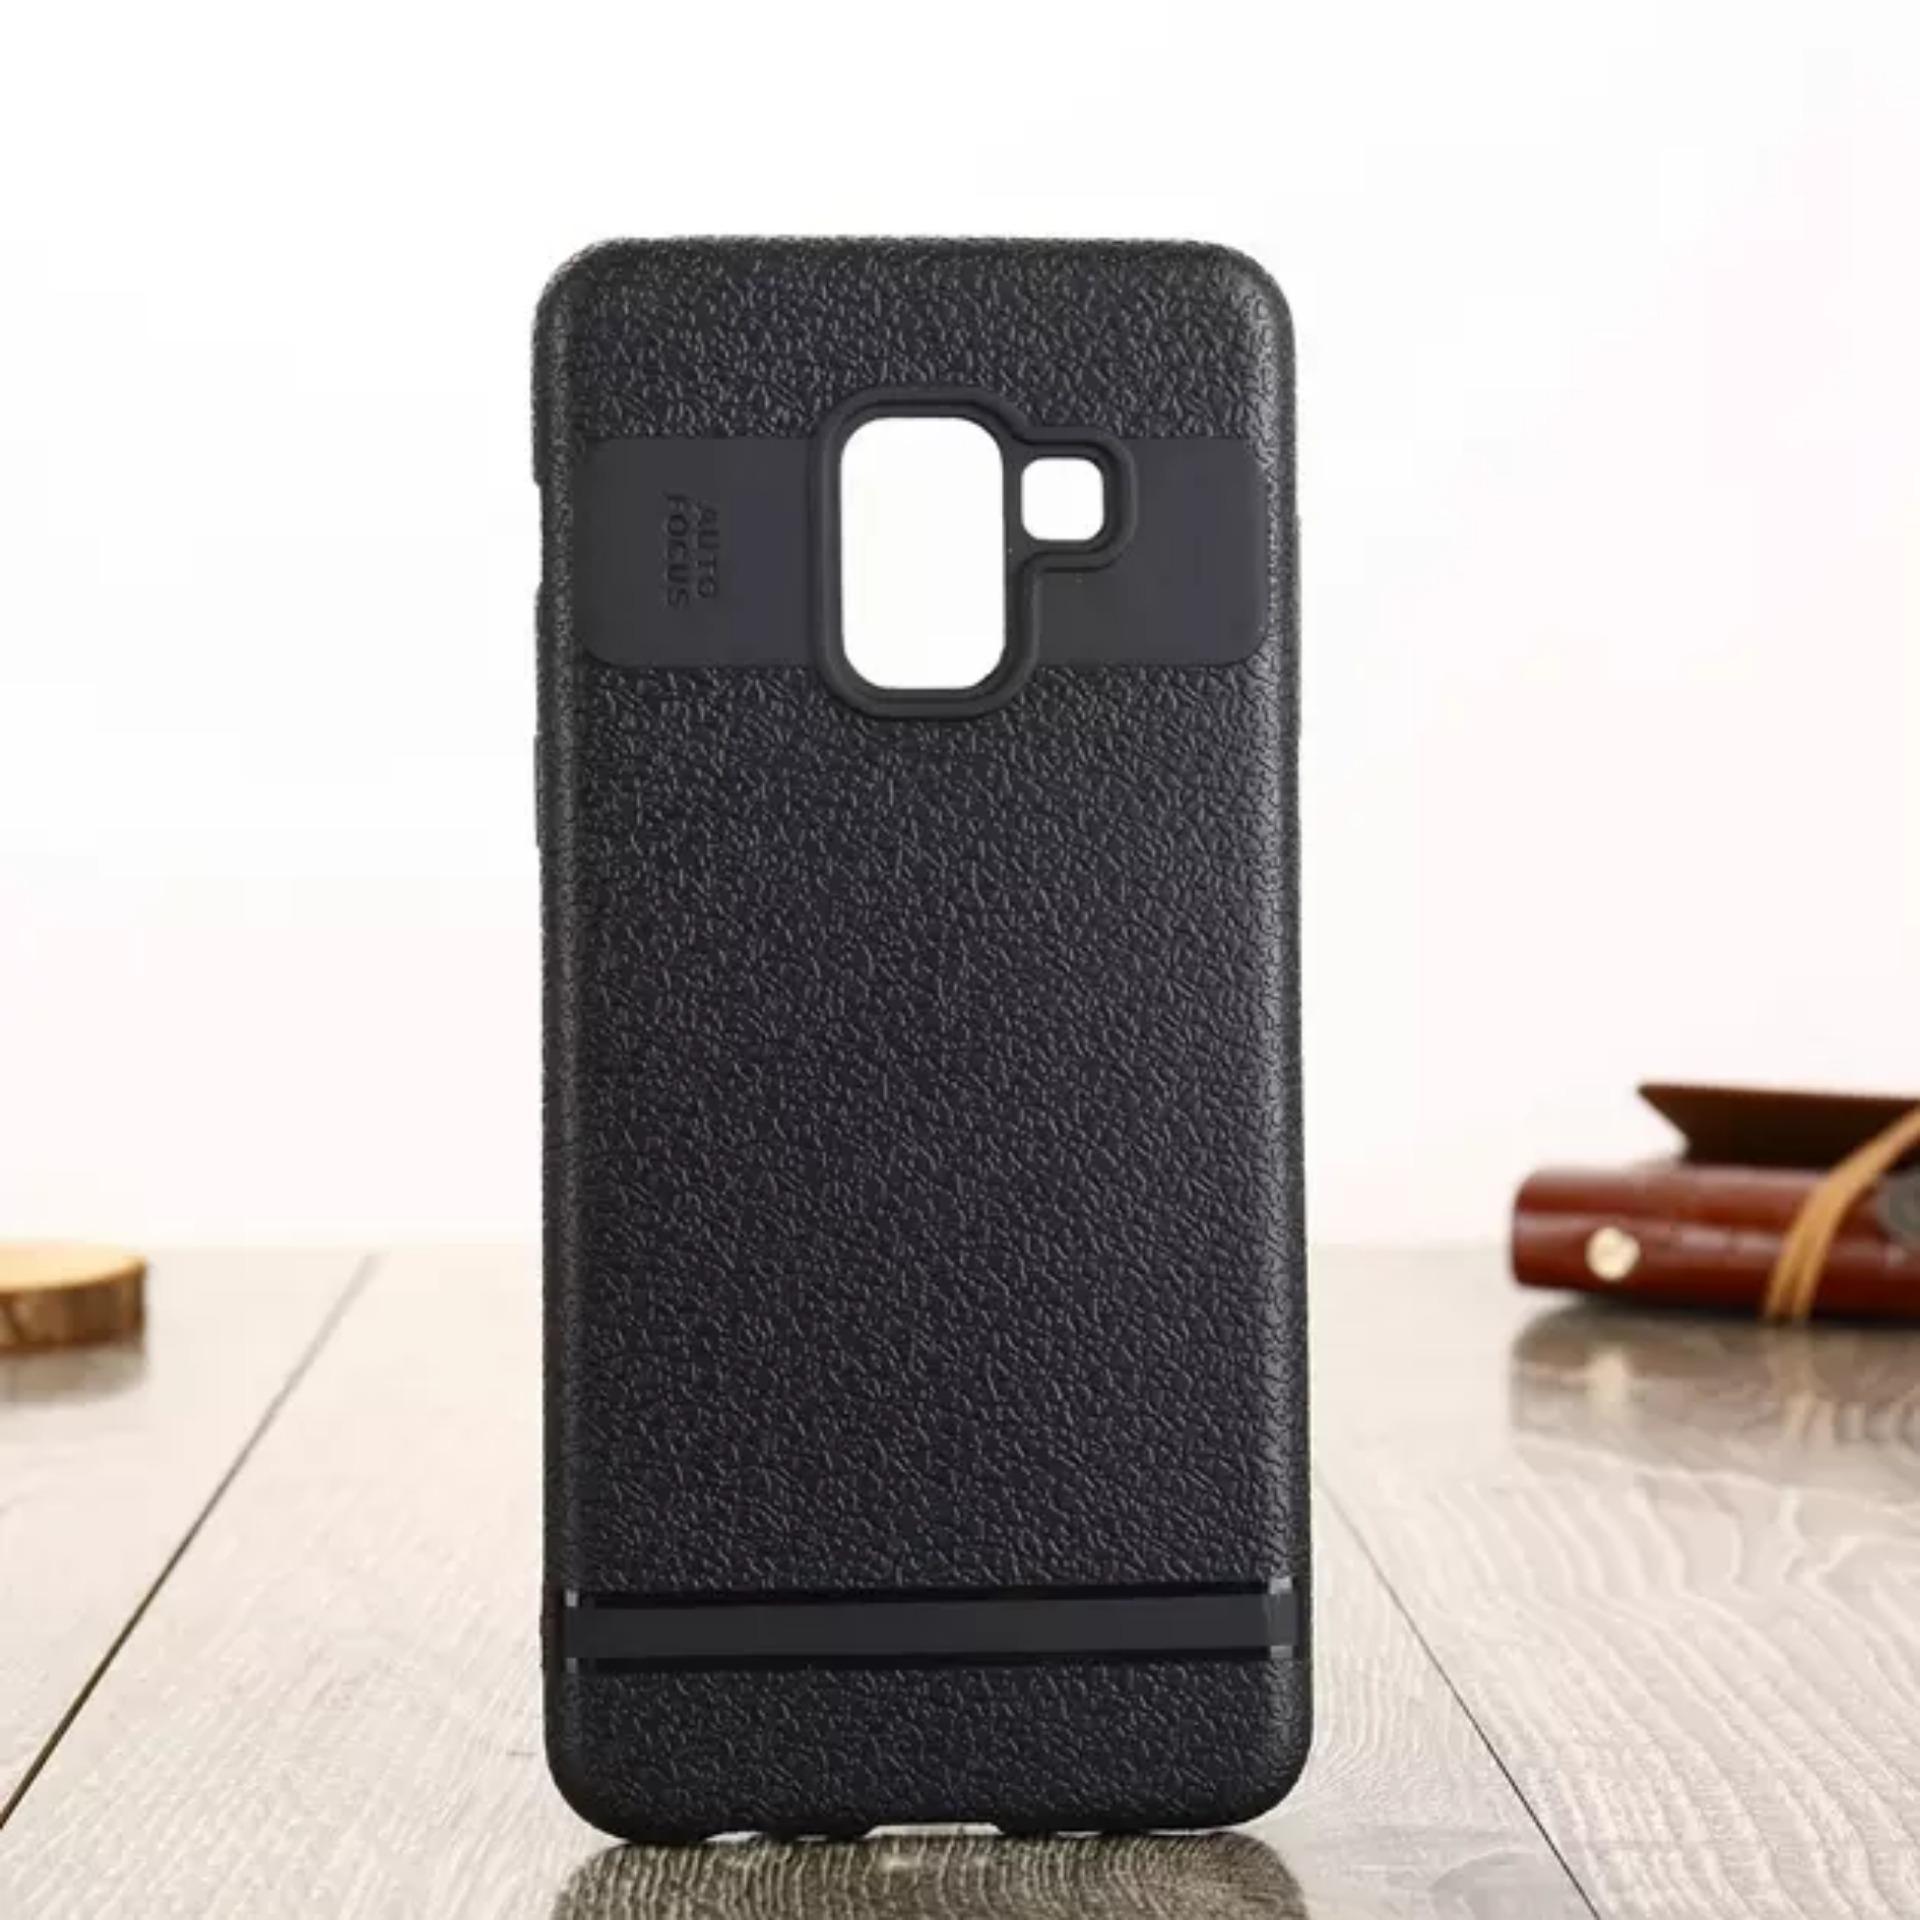 LOLLYPOP Auto Focus Samsung Galaxy J6 2018 Black Hitam TPU Flexible SOFTCASE Leather Premium Back Cover